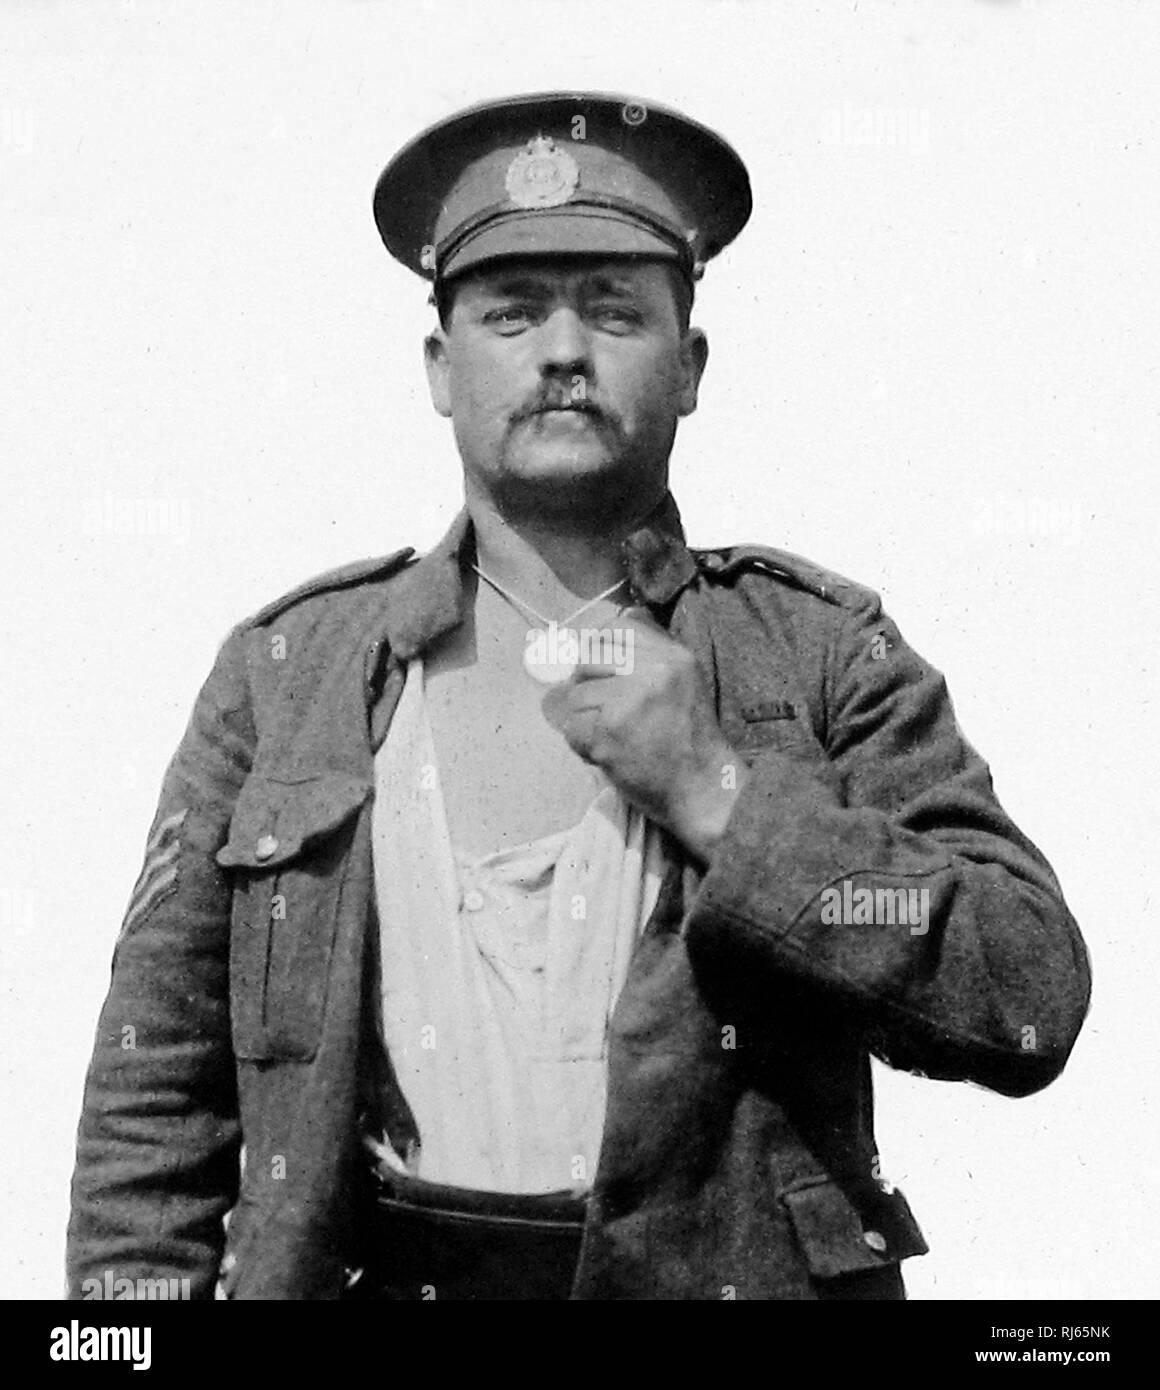 British Army identification badge WW1 - Stock Image